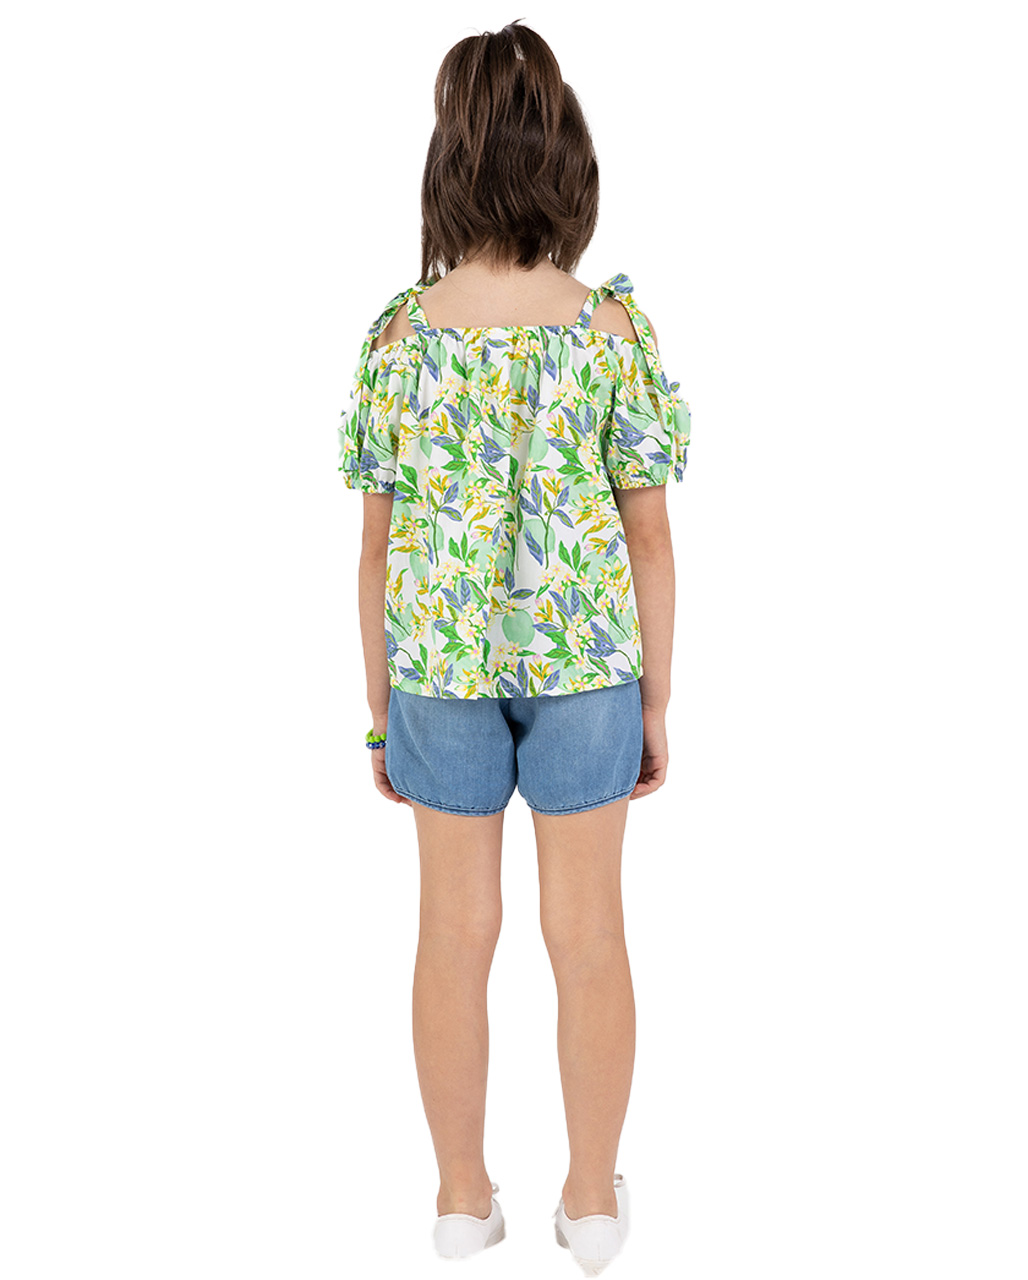 Conjunto infantil Bata e Shorts Floral Verde Beaba